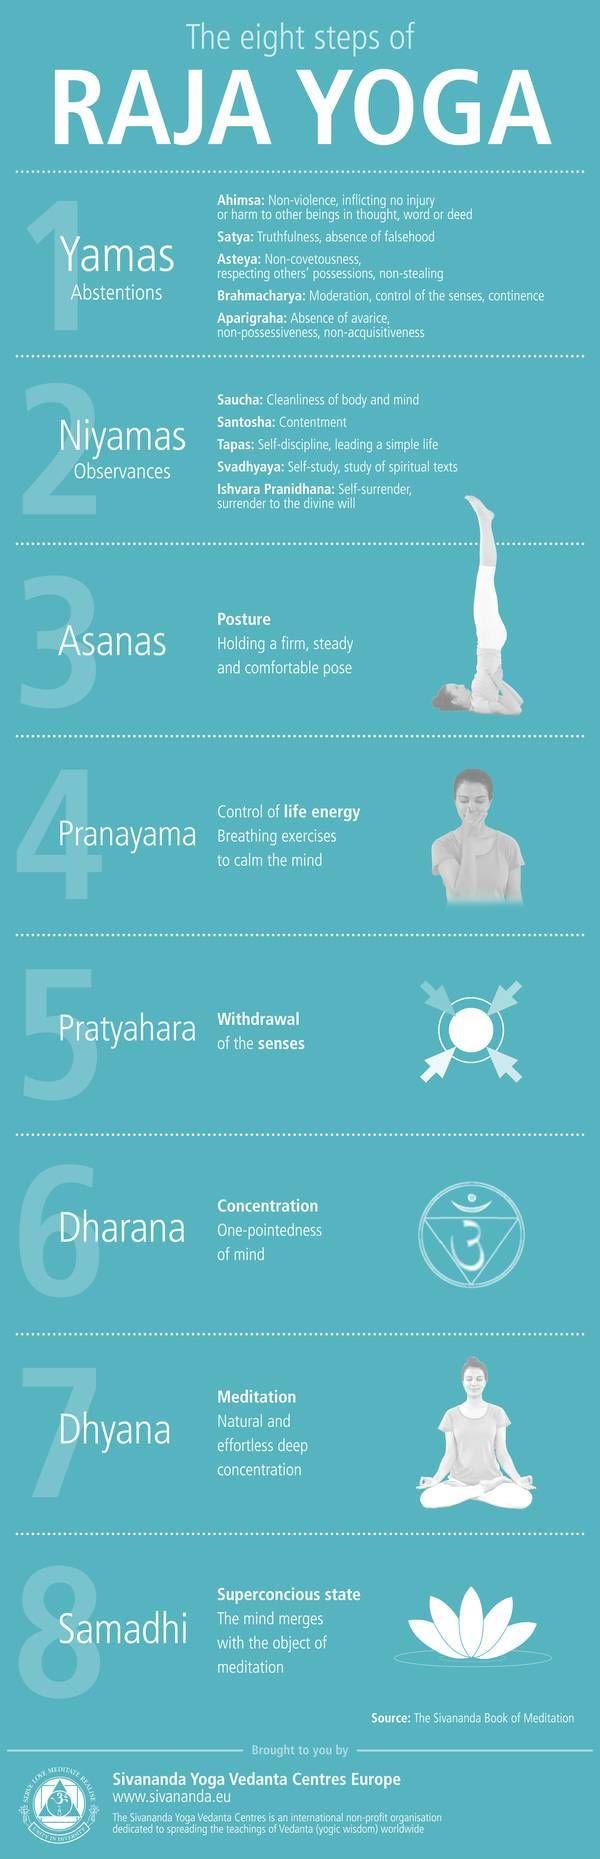 Risultati immagini per raja yoga